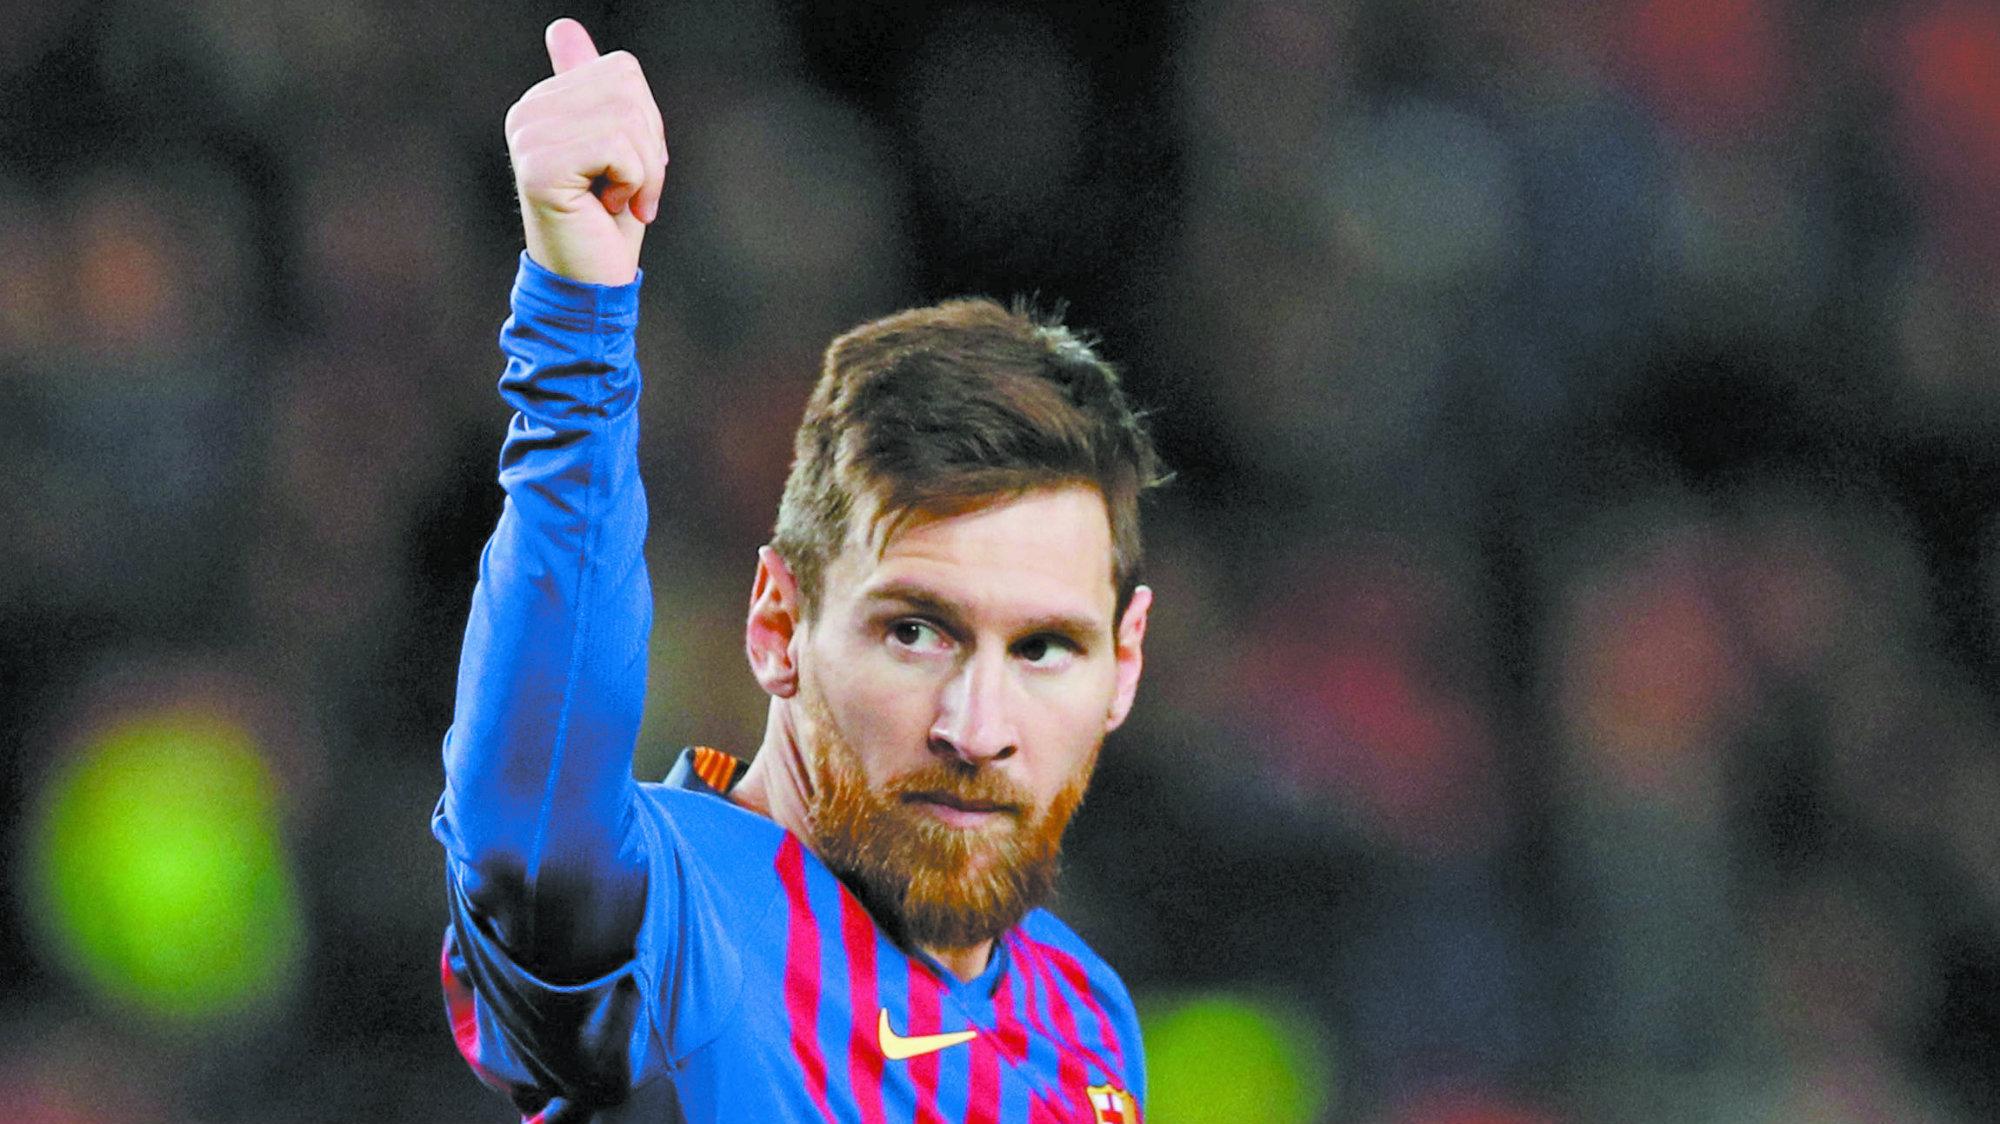 Lionel Messi demanda incumplimiento contrato rechazada